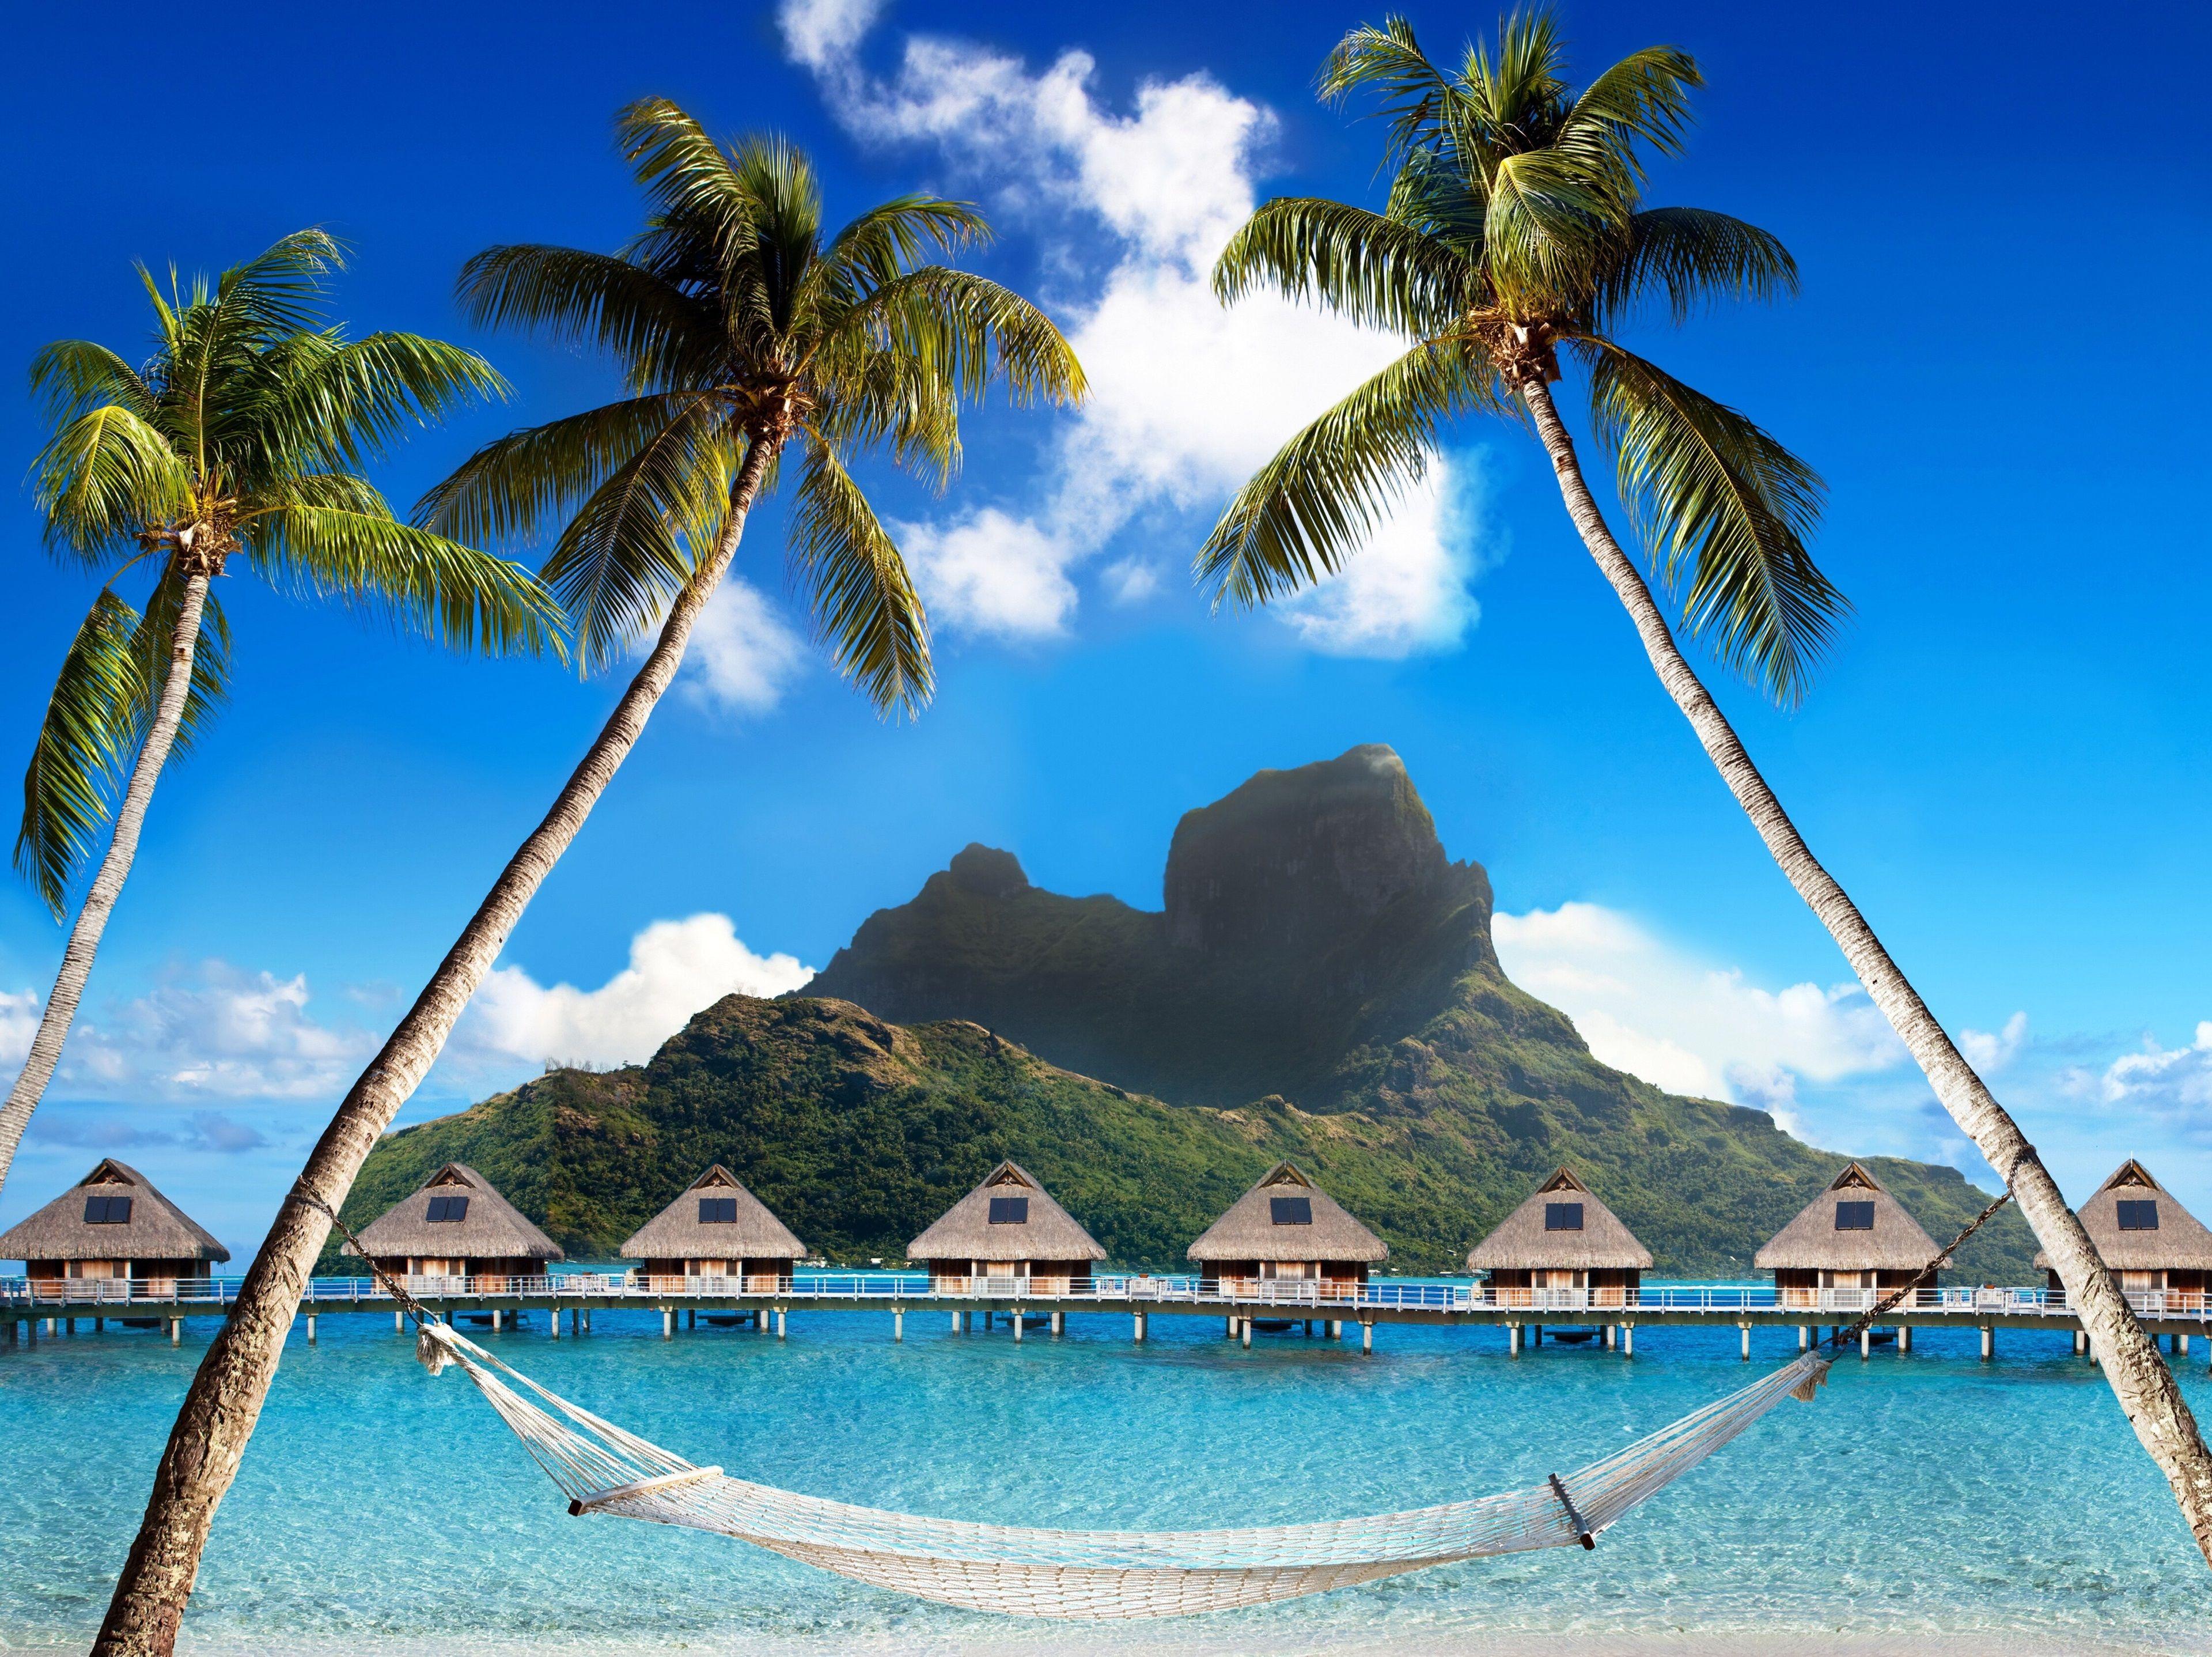 3840x2876 Bora Bora 4k Ultra Hd Desktop Wallpaper Honeymoon